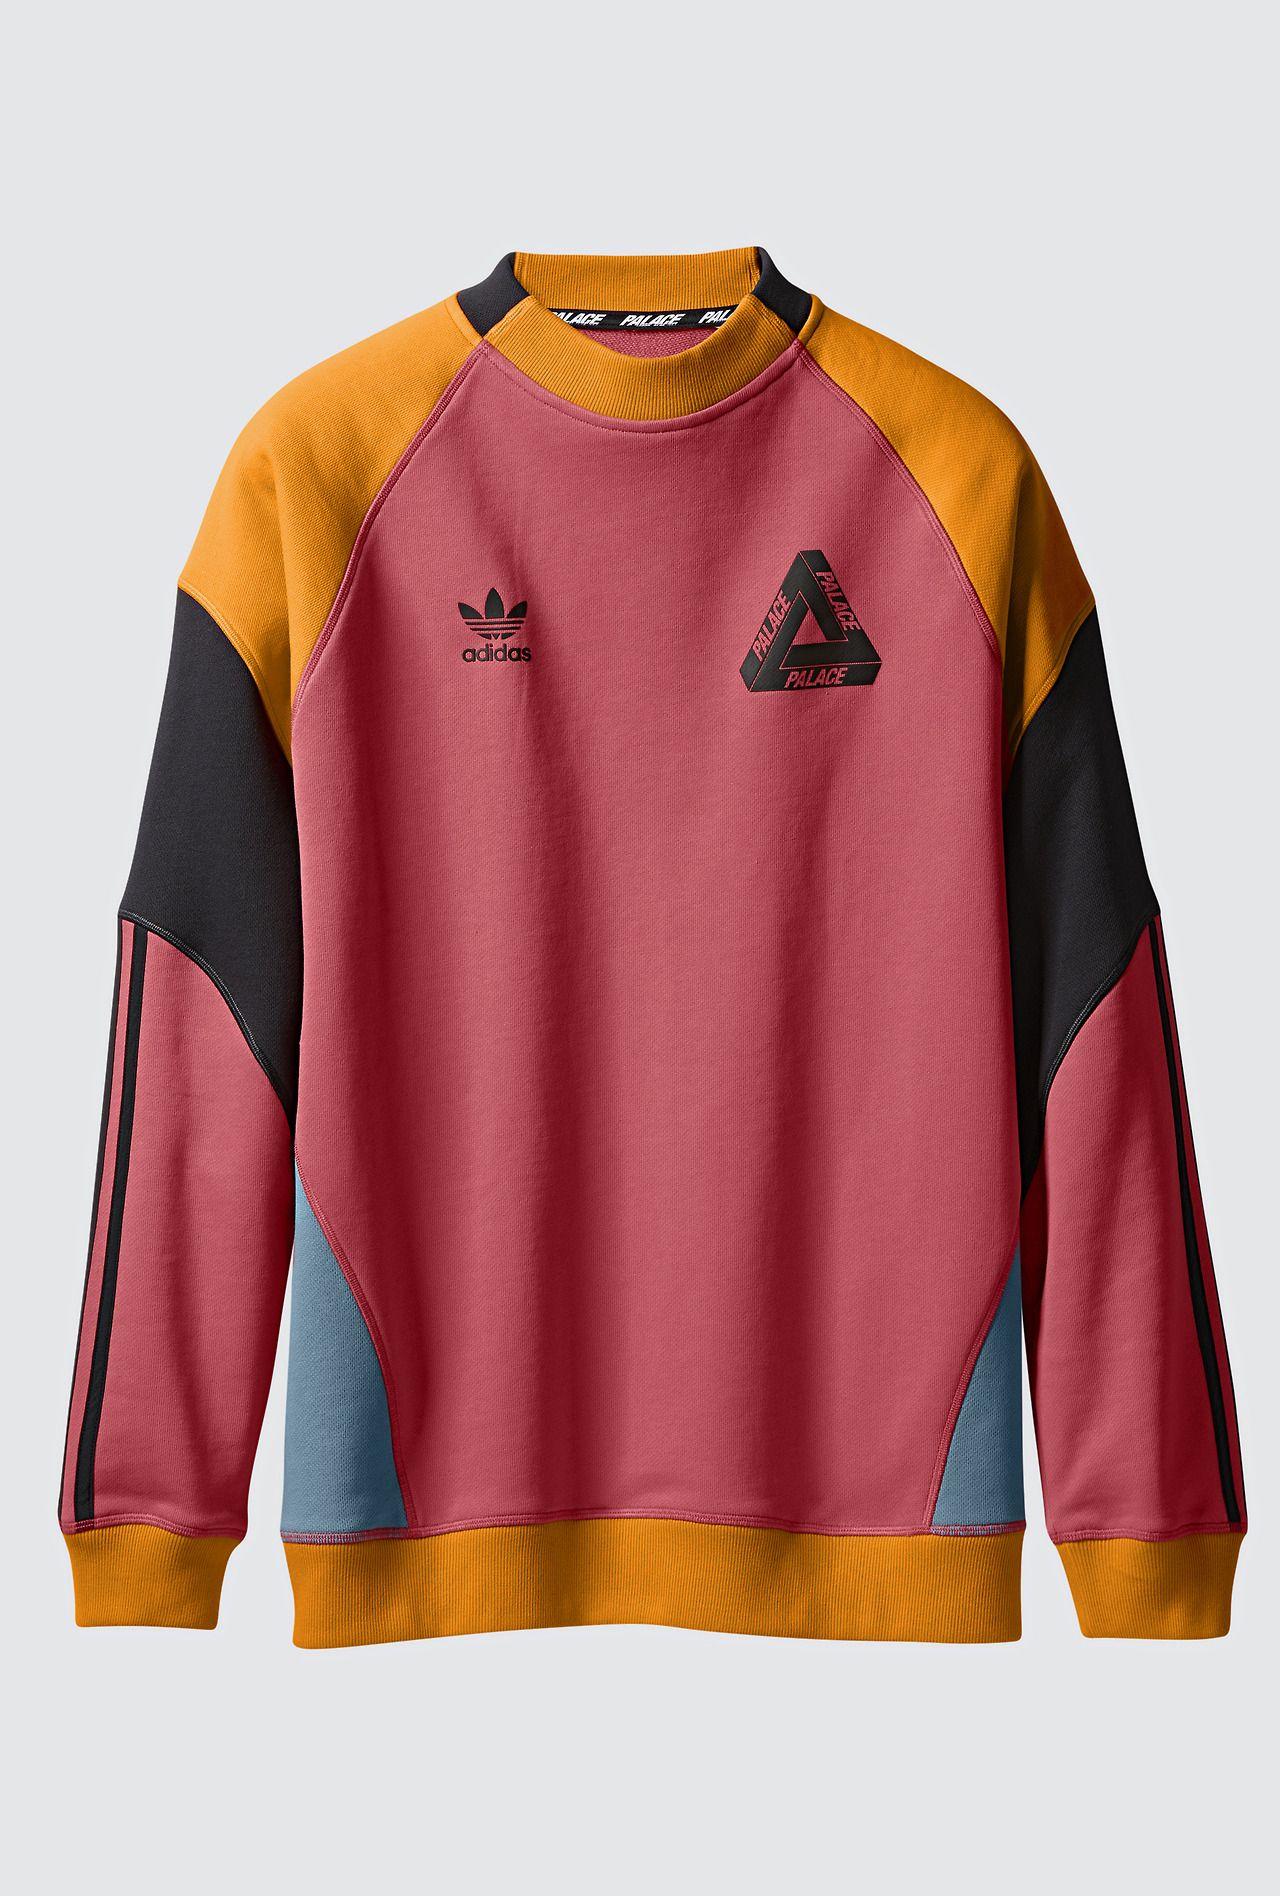 Adidas Originals X Palace Vintage Hoodies Adidas Originals Outfit Palace Clothing [ 1896 x 1280 Pixel ]